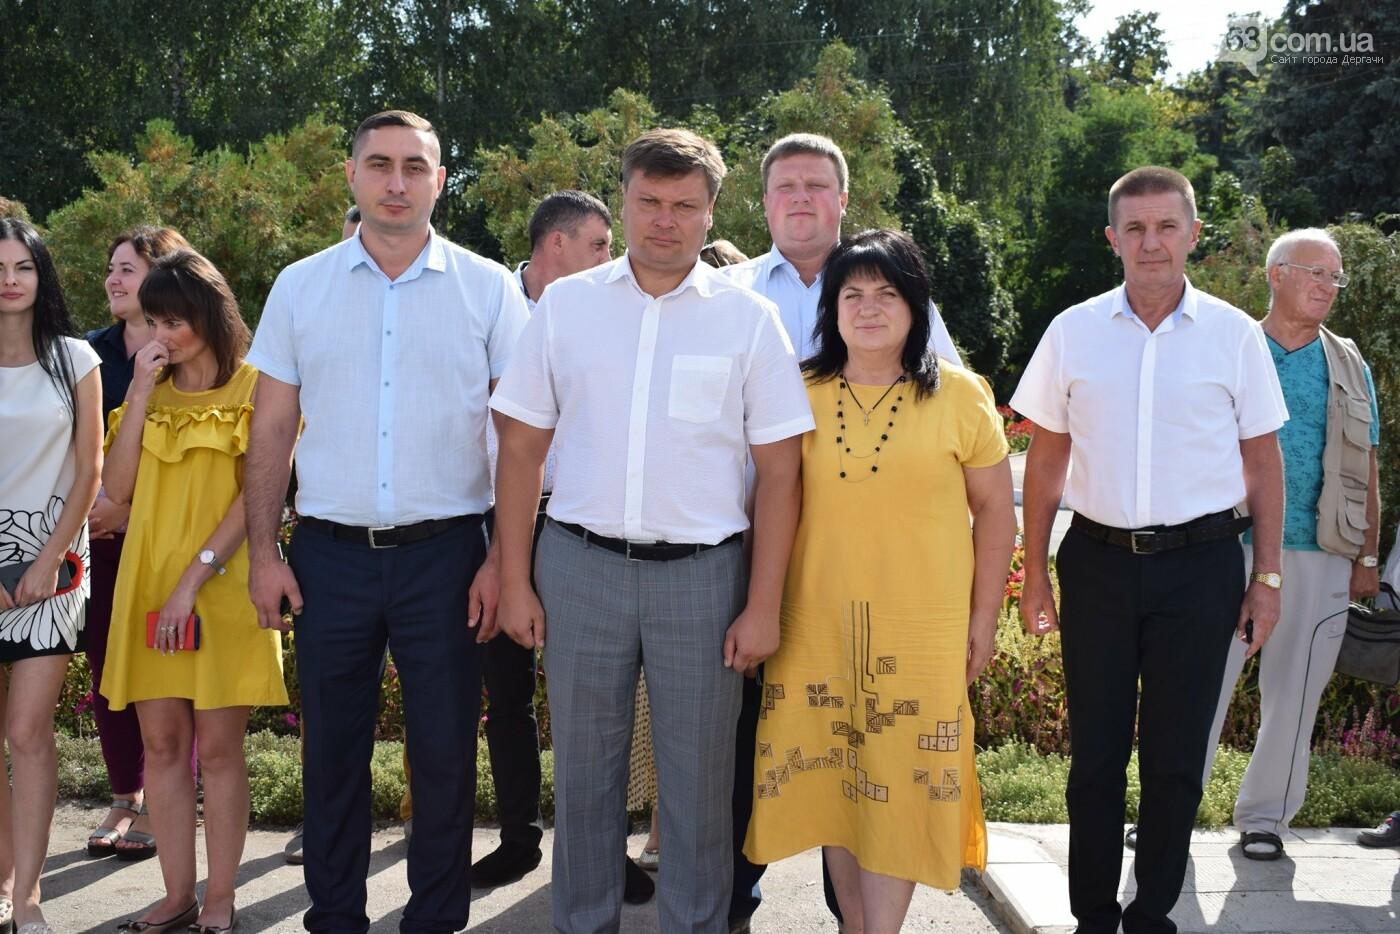 В Дергачах подняли флаг Украины (фото), фото-3